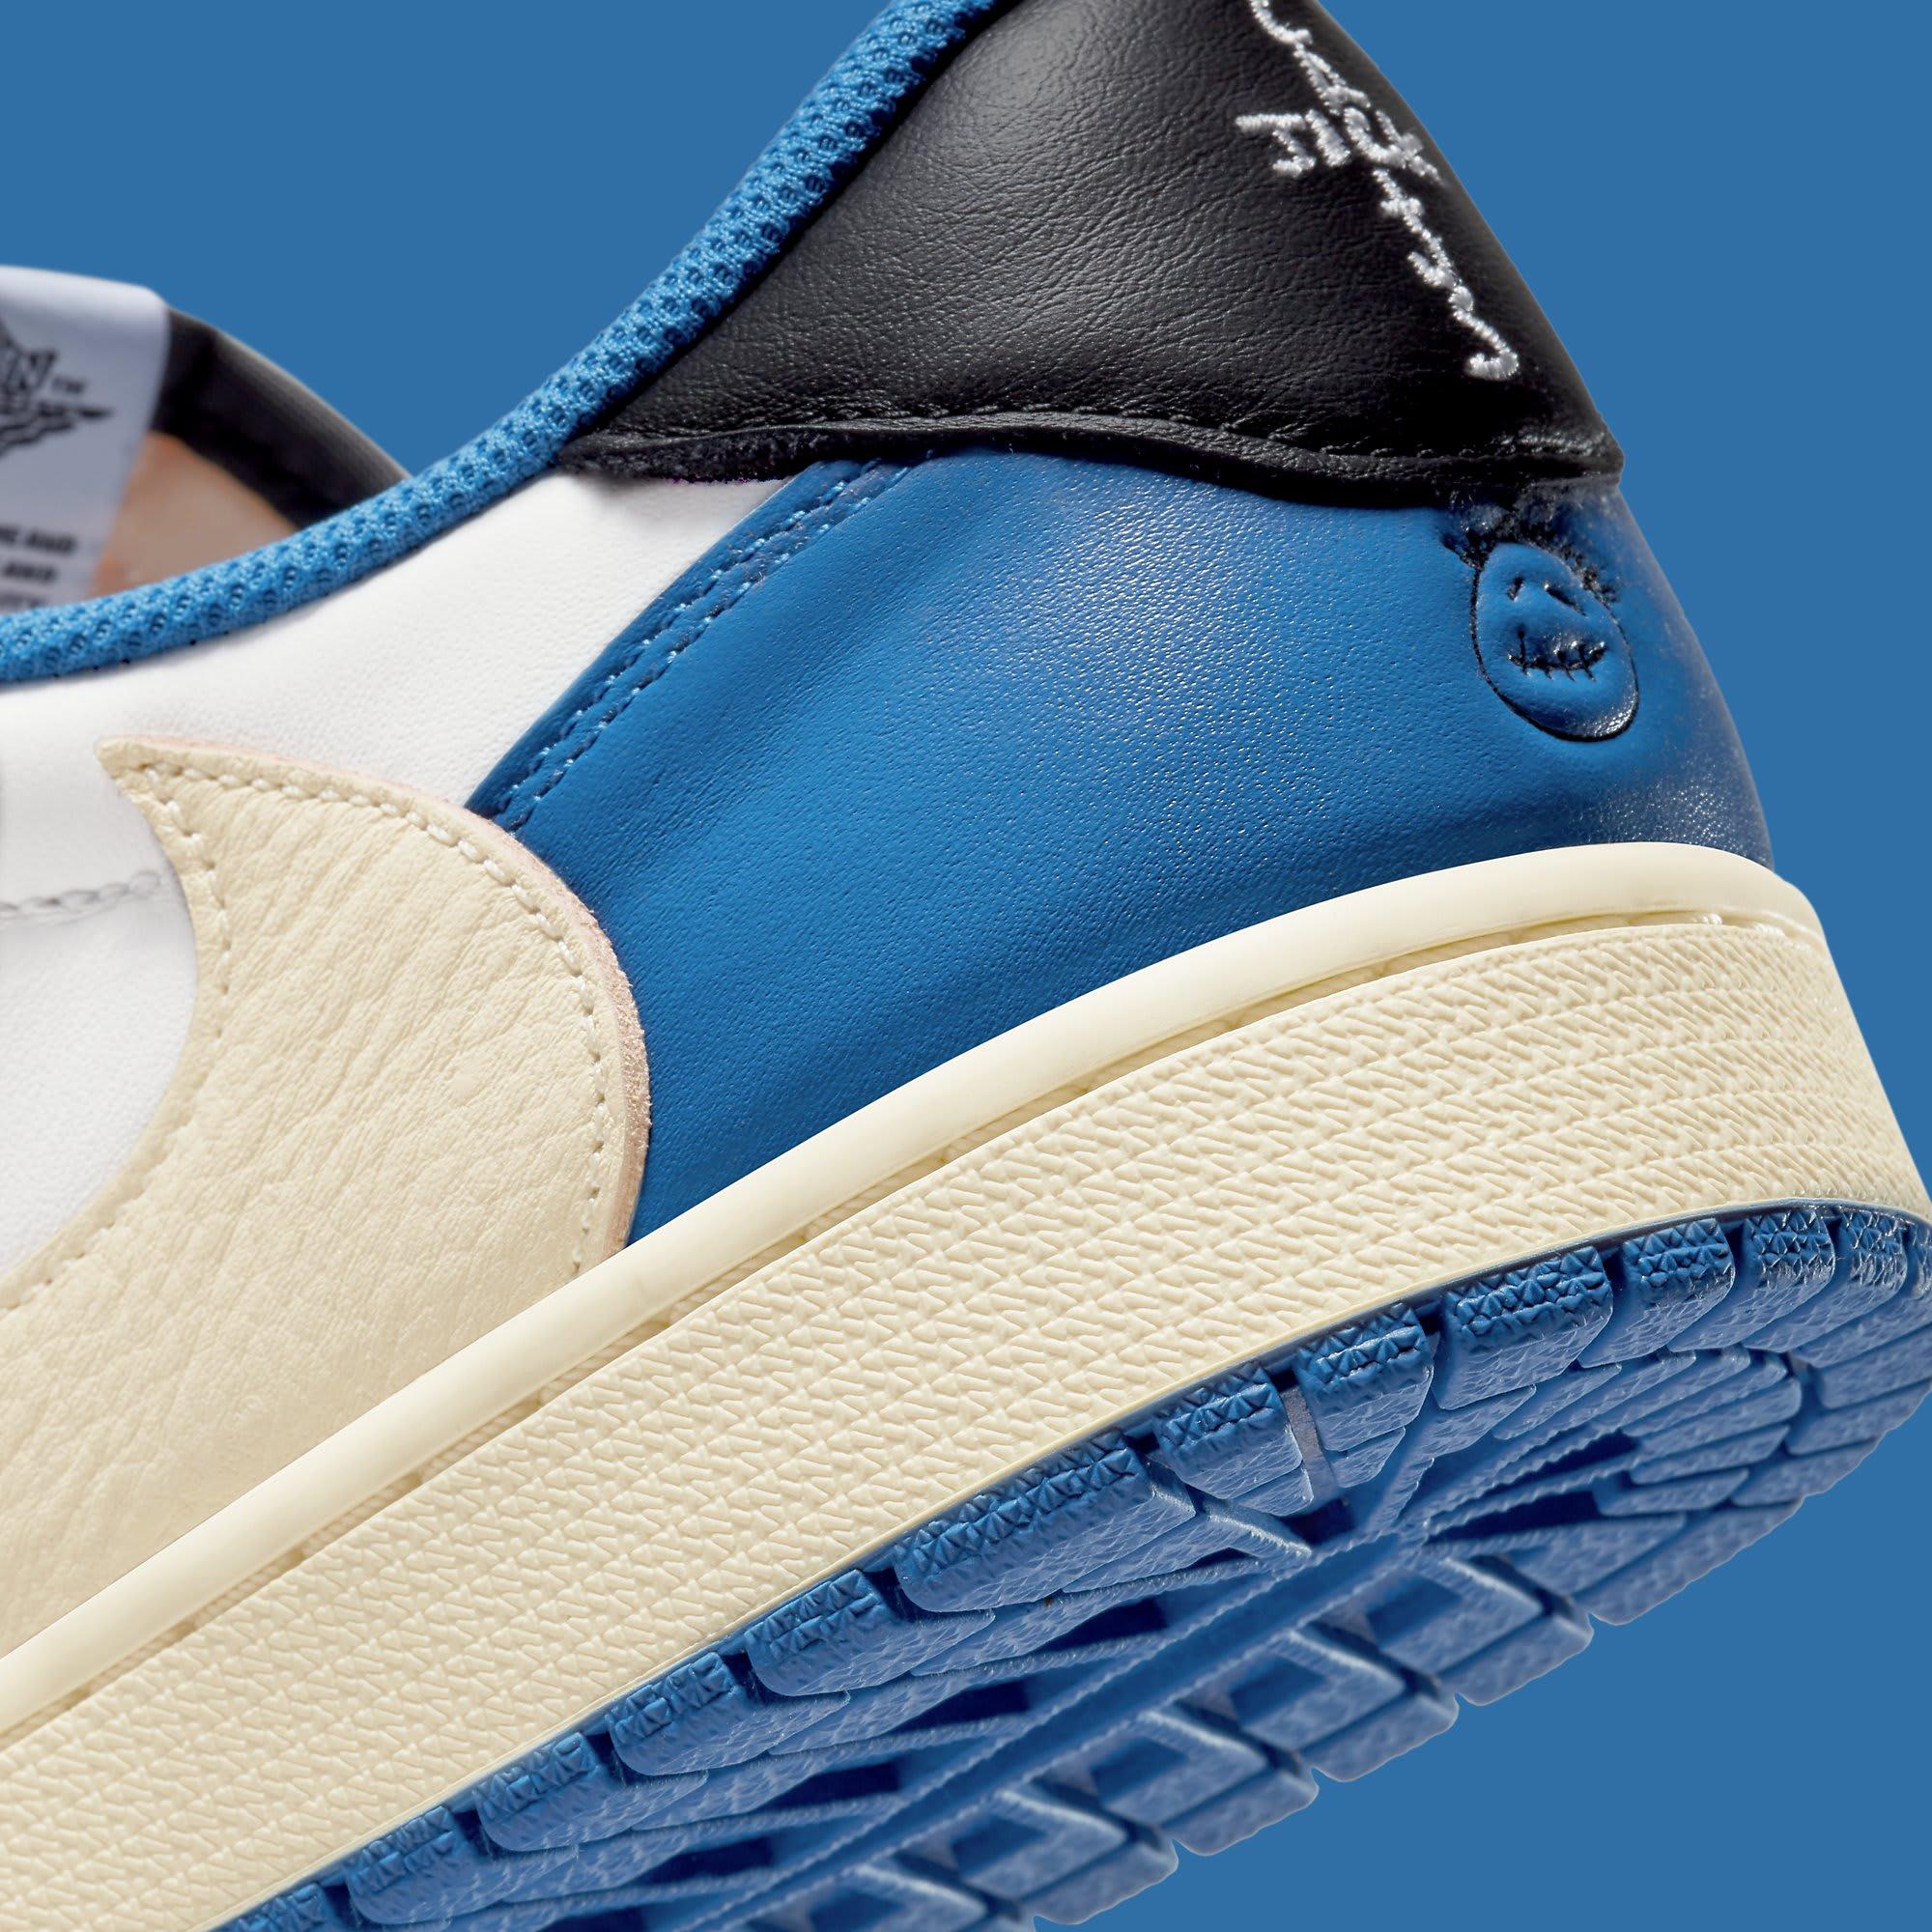 Travis Scott x Fragment x Air Jordan 1 Low Release Date DM7866-140 Heel Detail